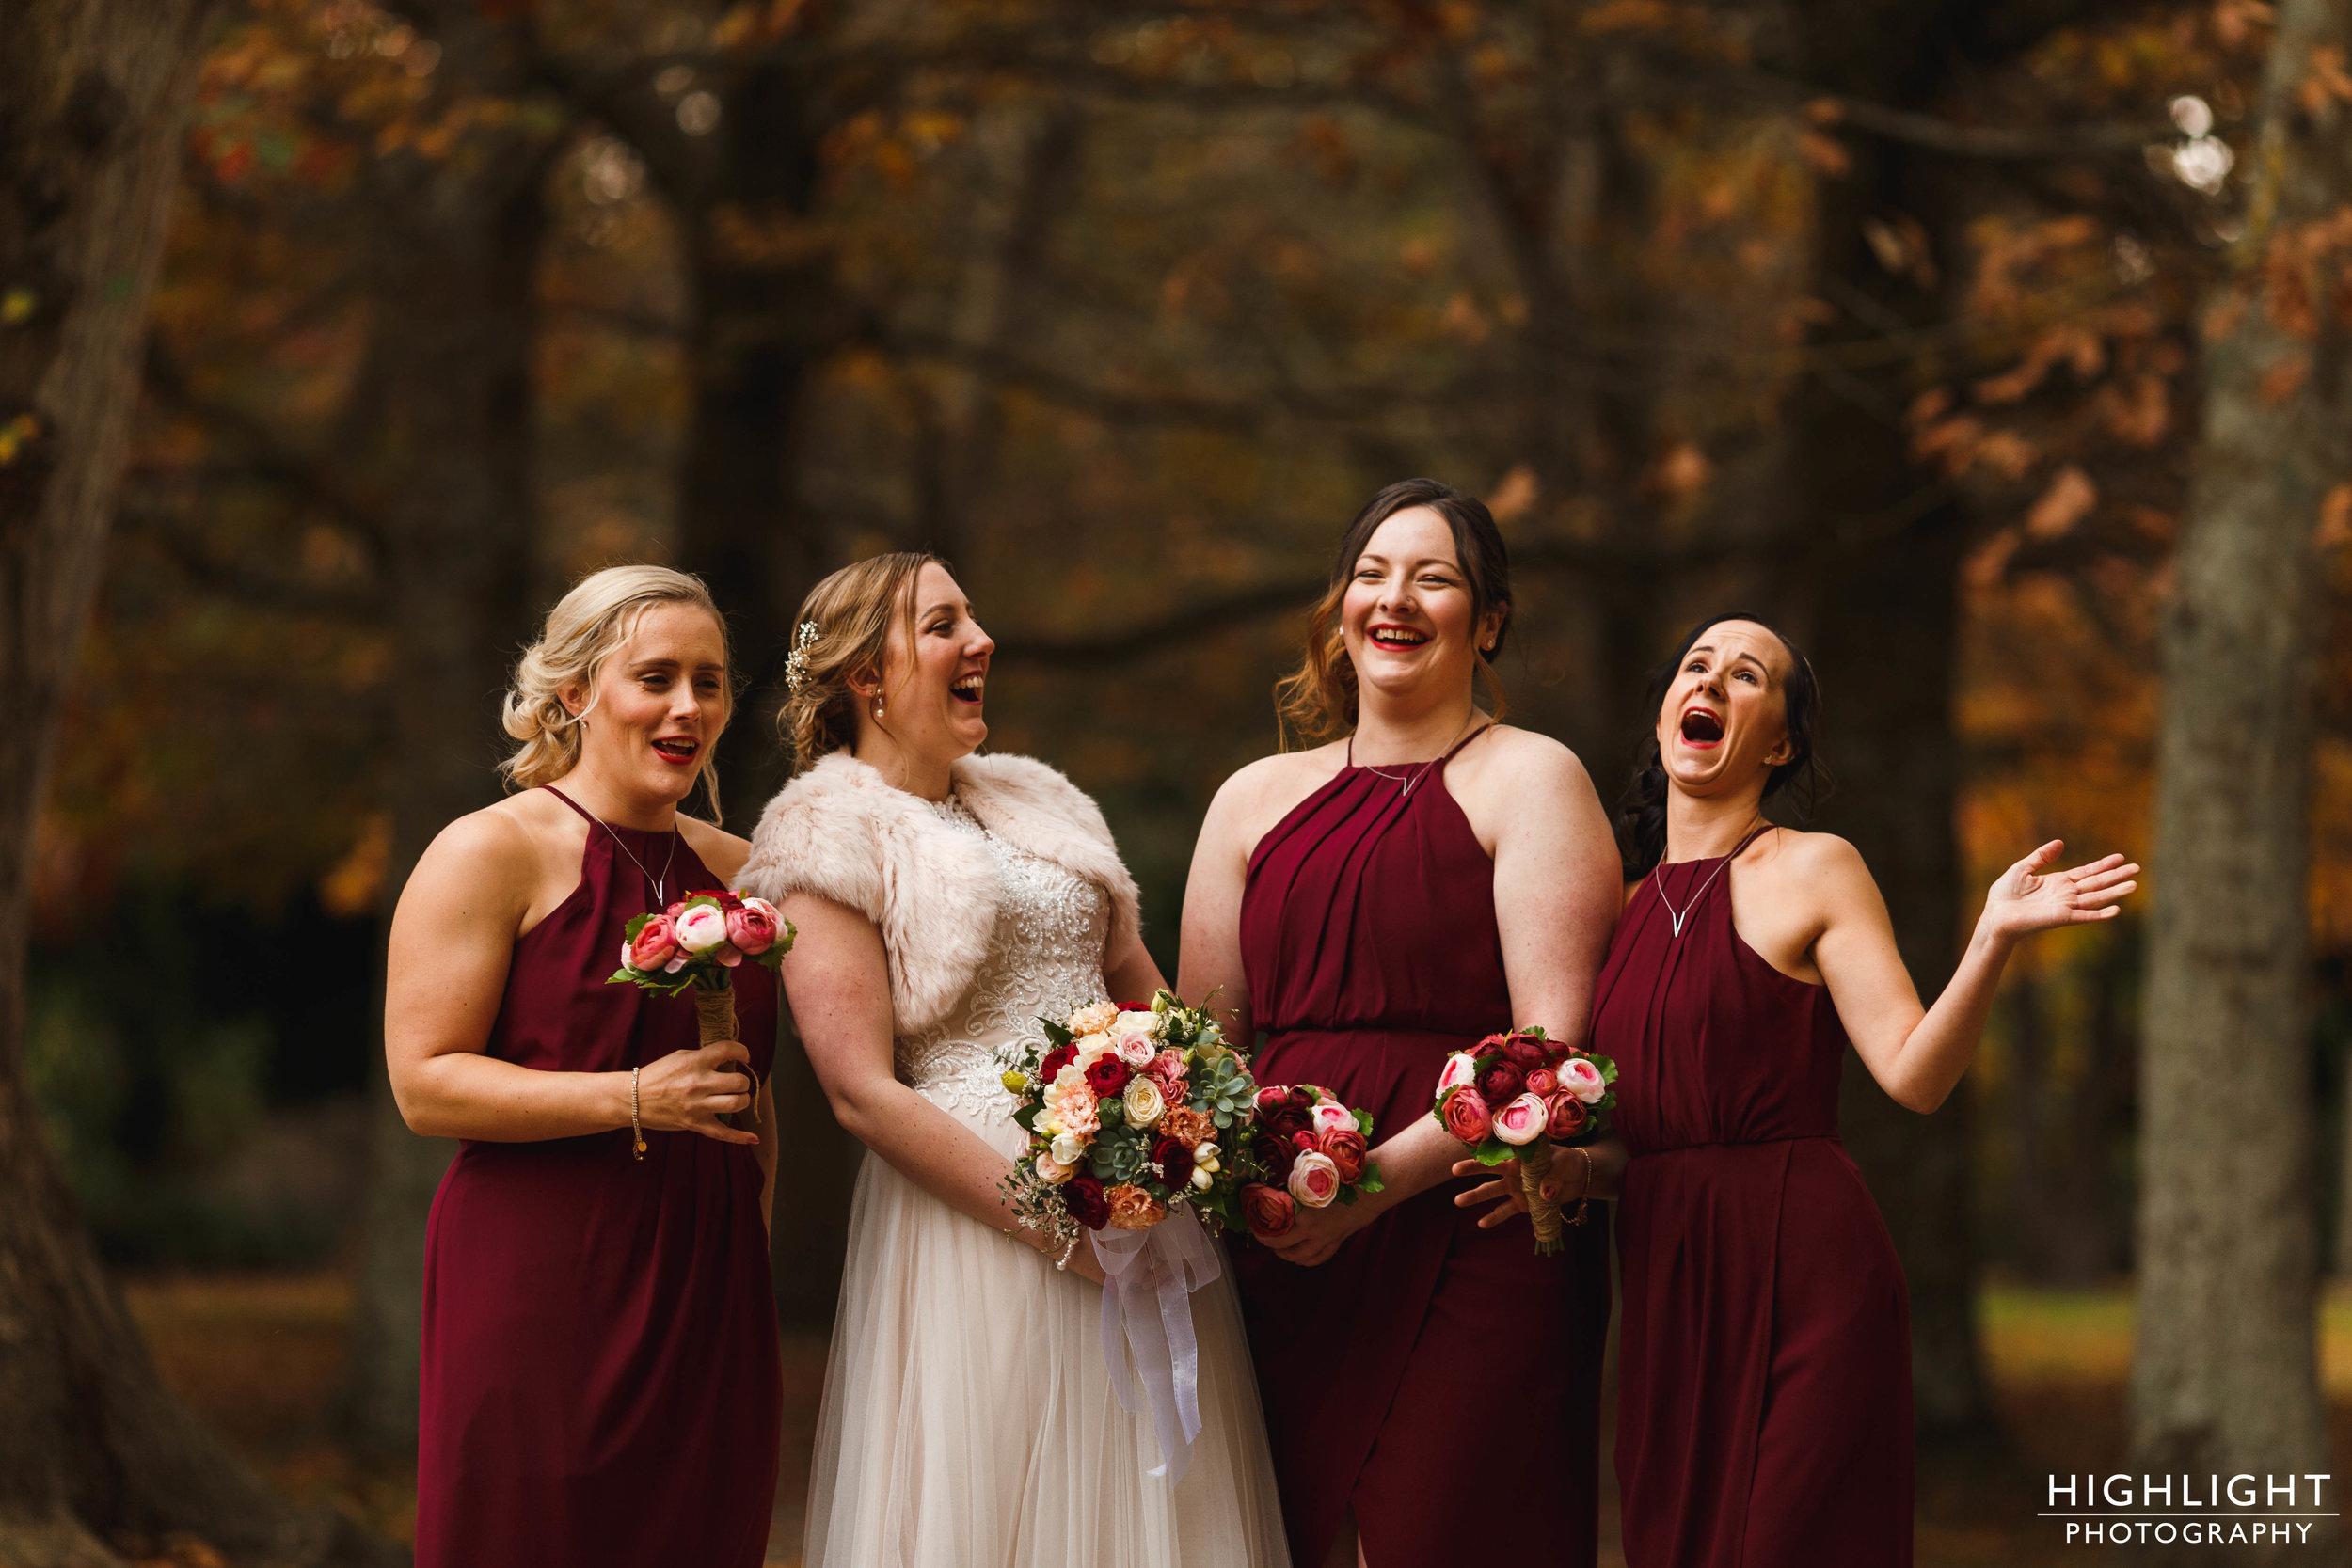 highlight-wedding-photography-palmerston-north-new-zealand-manawatu-chalet-69.jpg